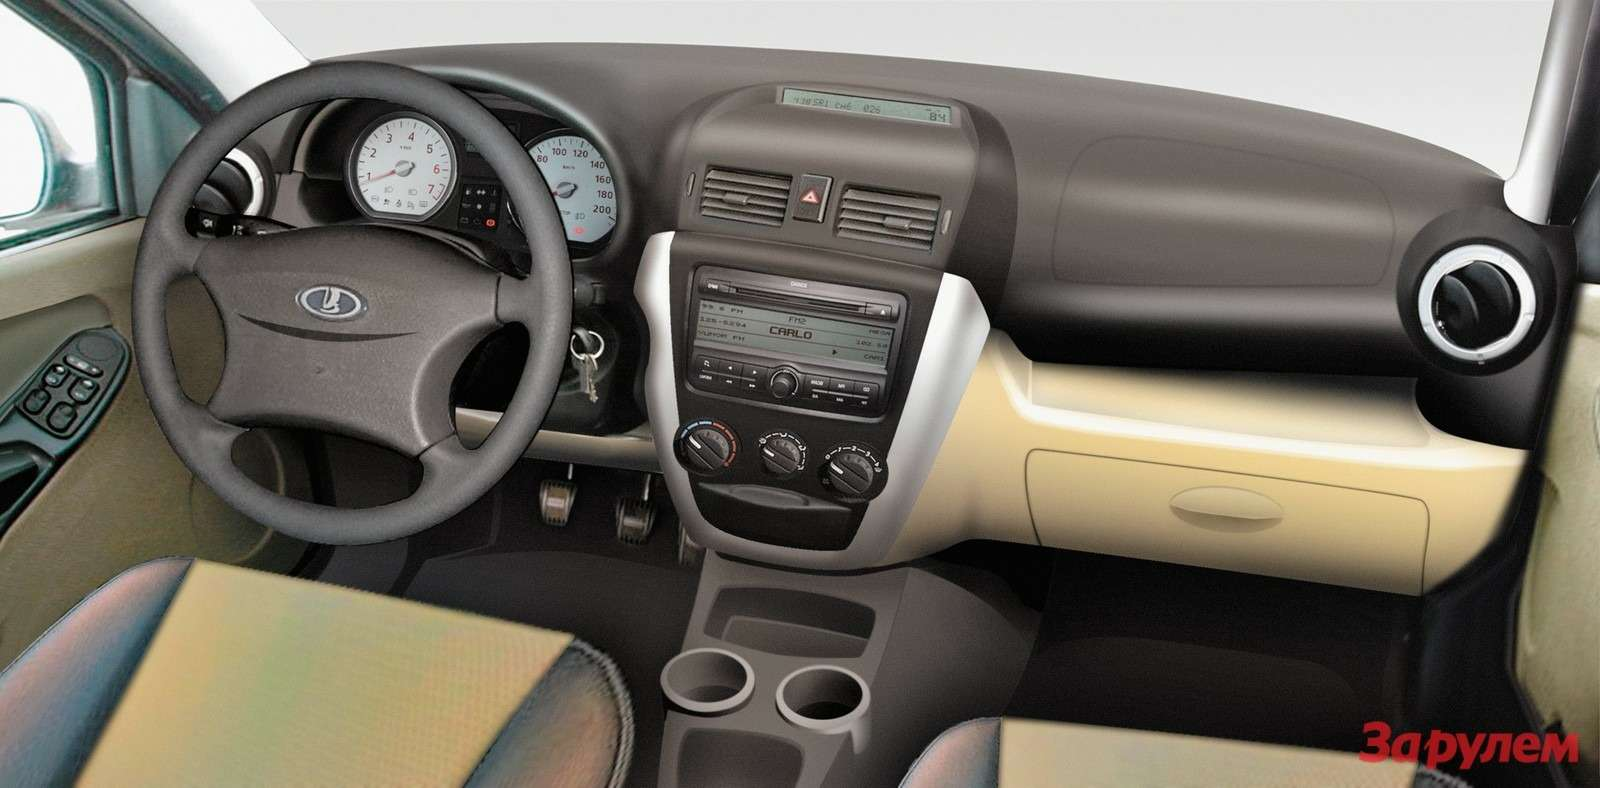 Рисунок передней панели Lada Granta